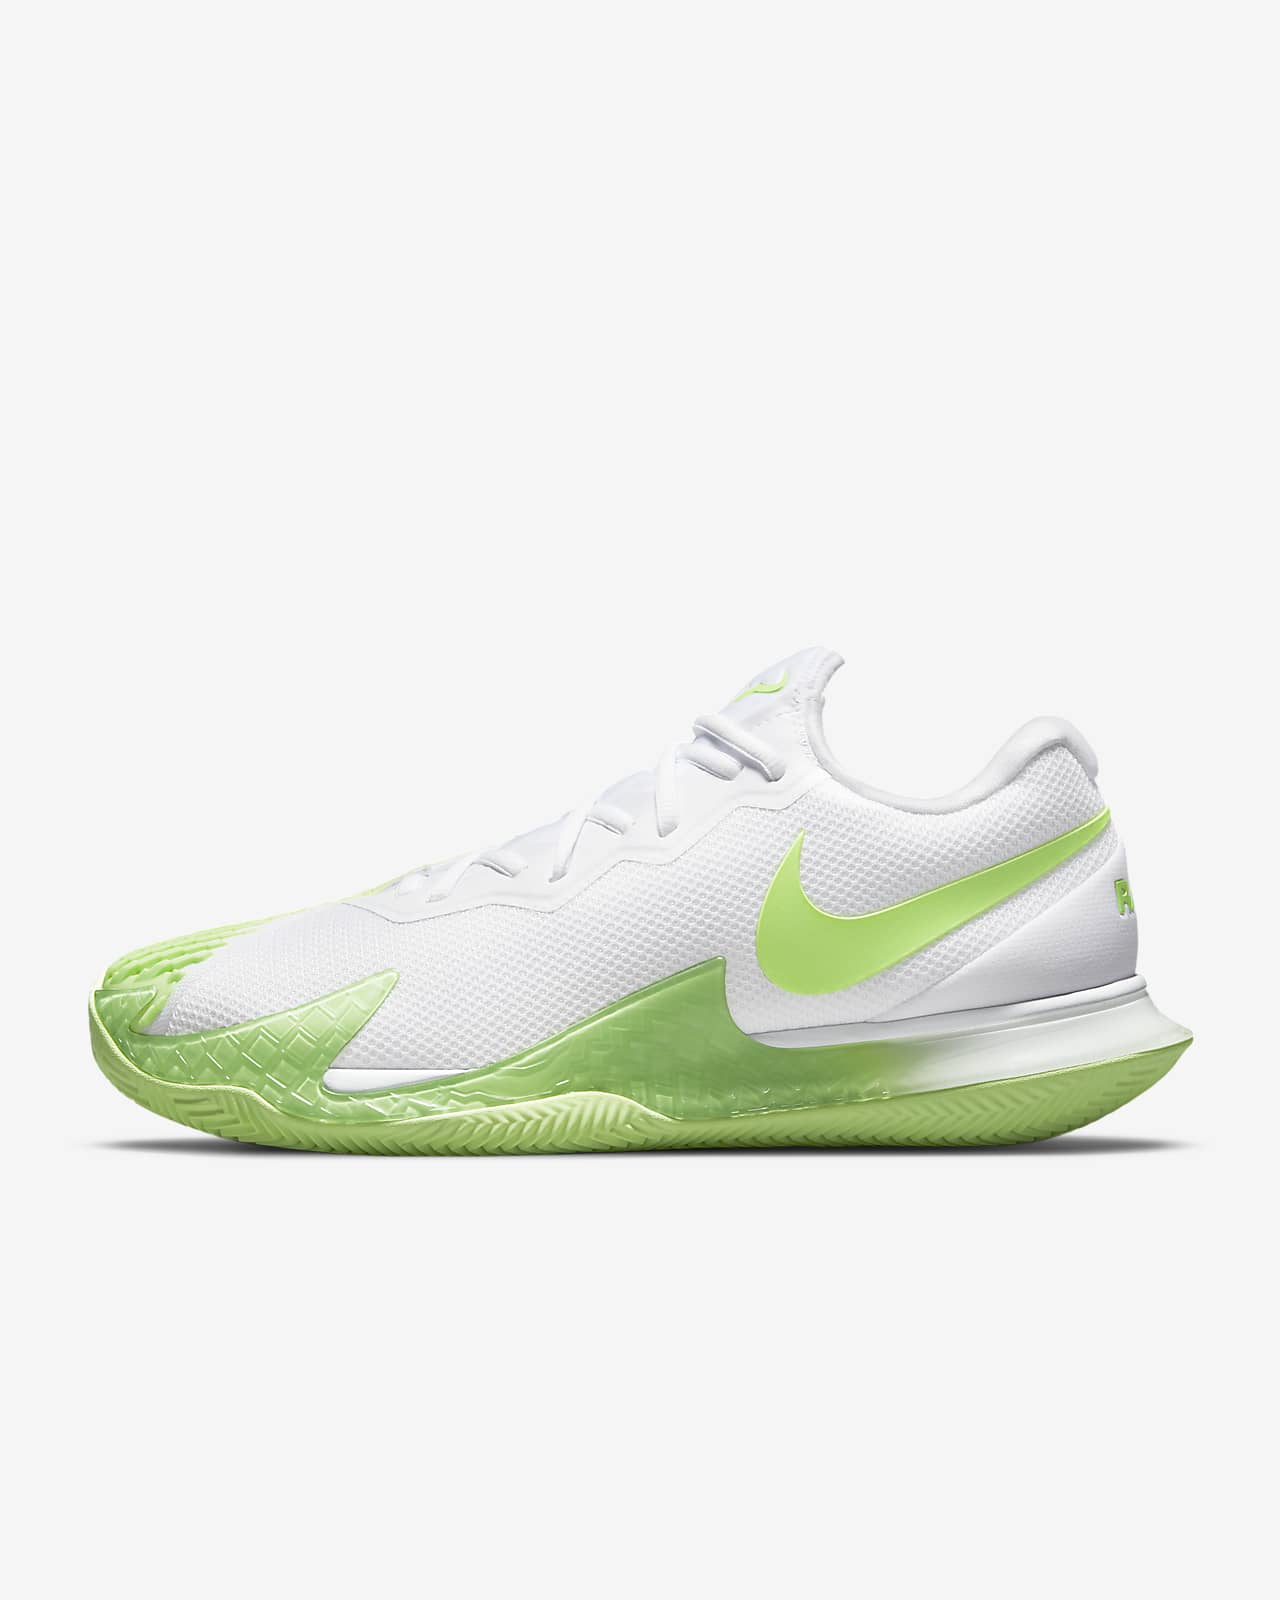 NikeCourt Zoom Vapor Cage 4 Rafa Men's Clay Court Tennis Shoe